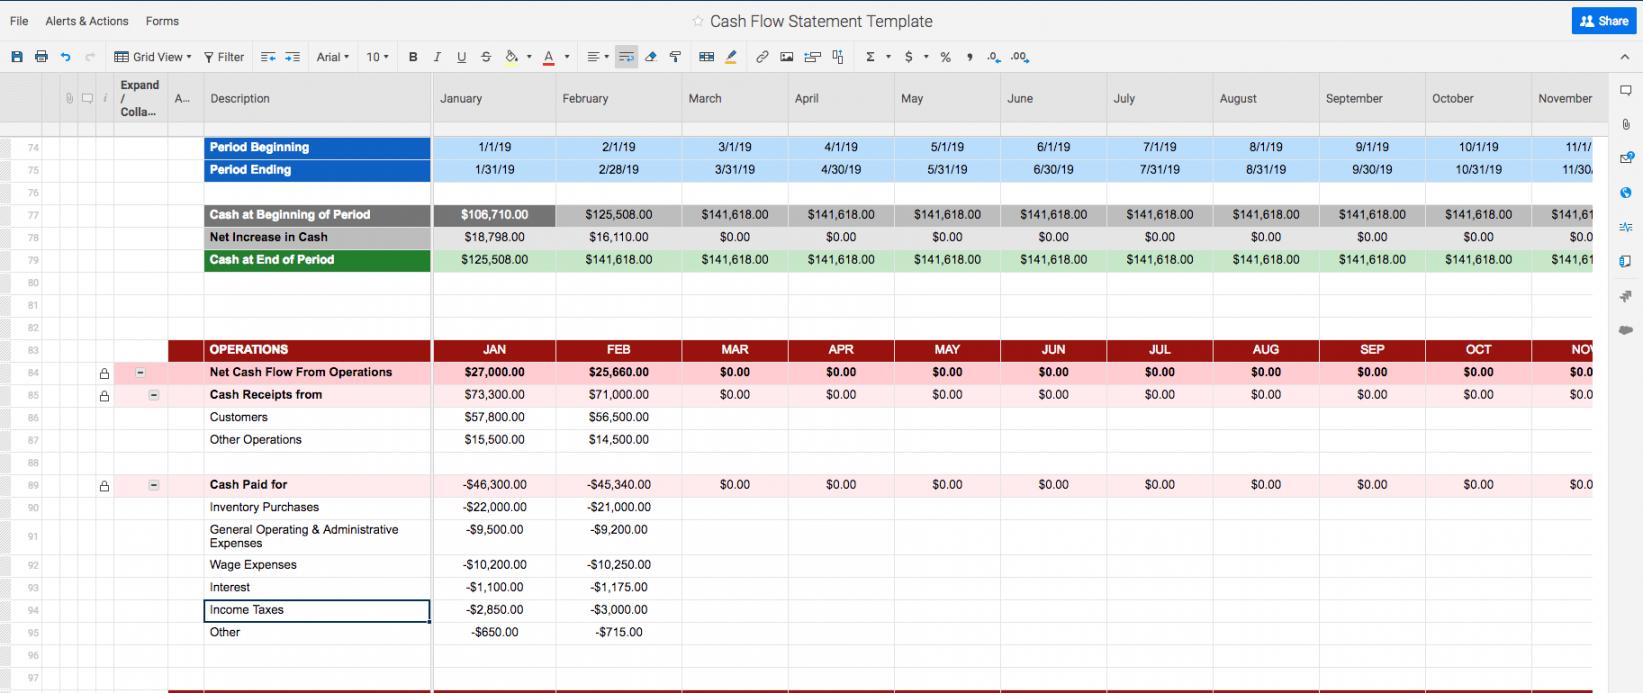 Cash Flow Analysis Spreadsheet Template